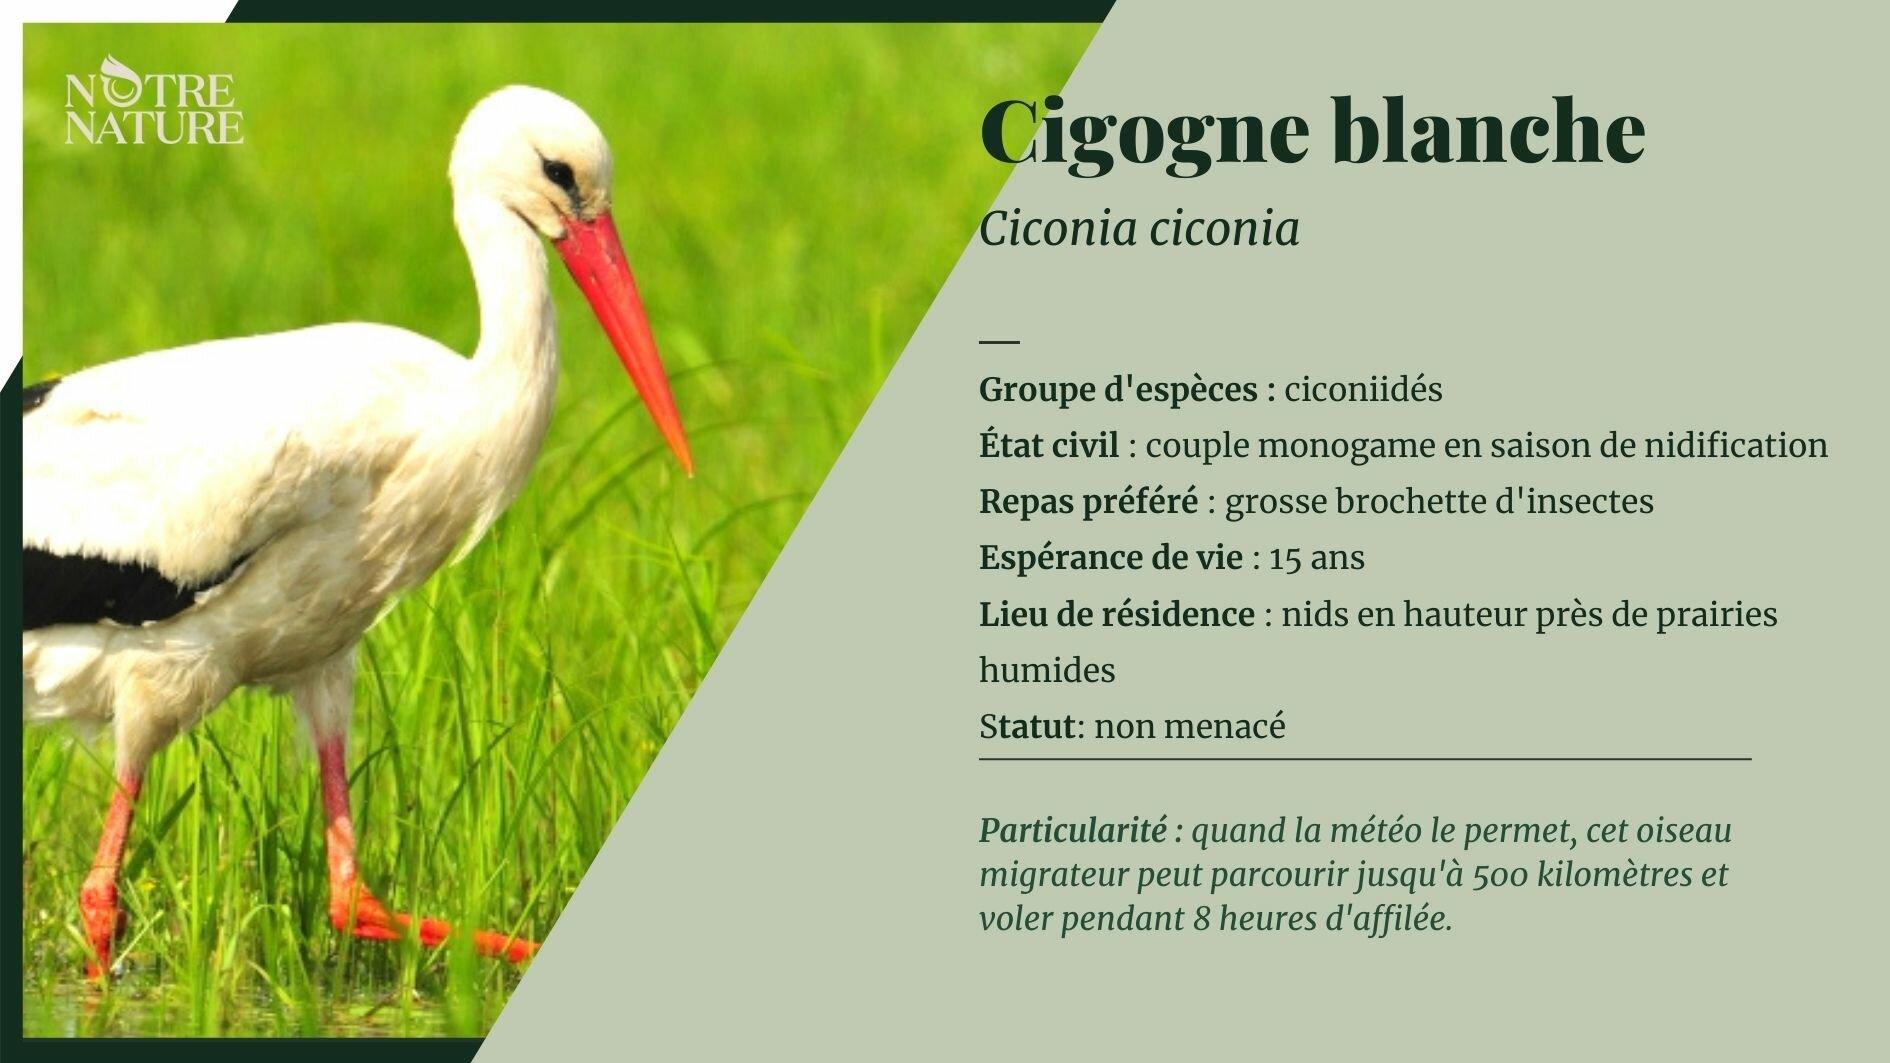 cigogne-blanche.jpg